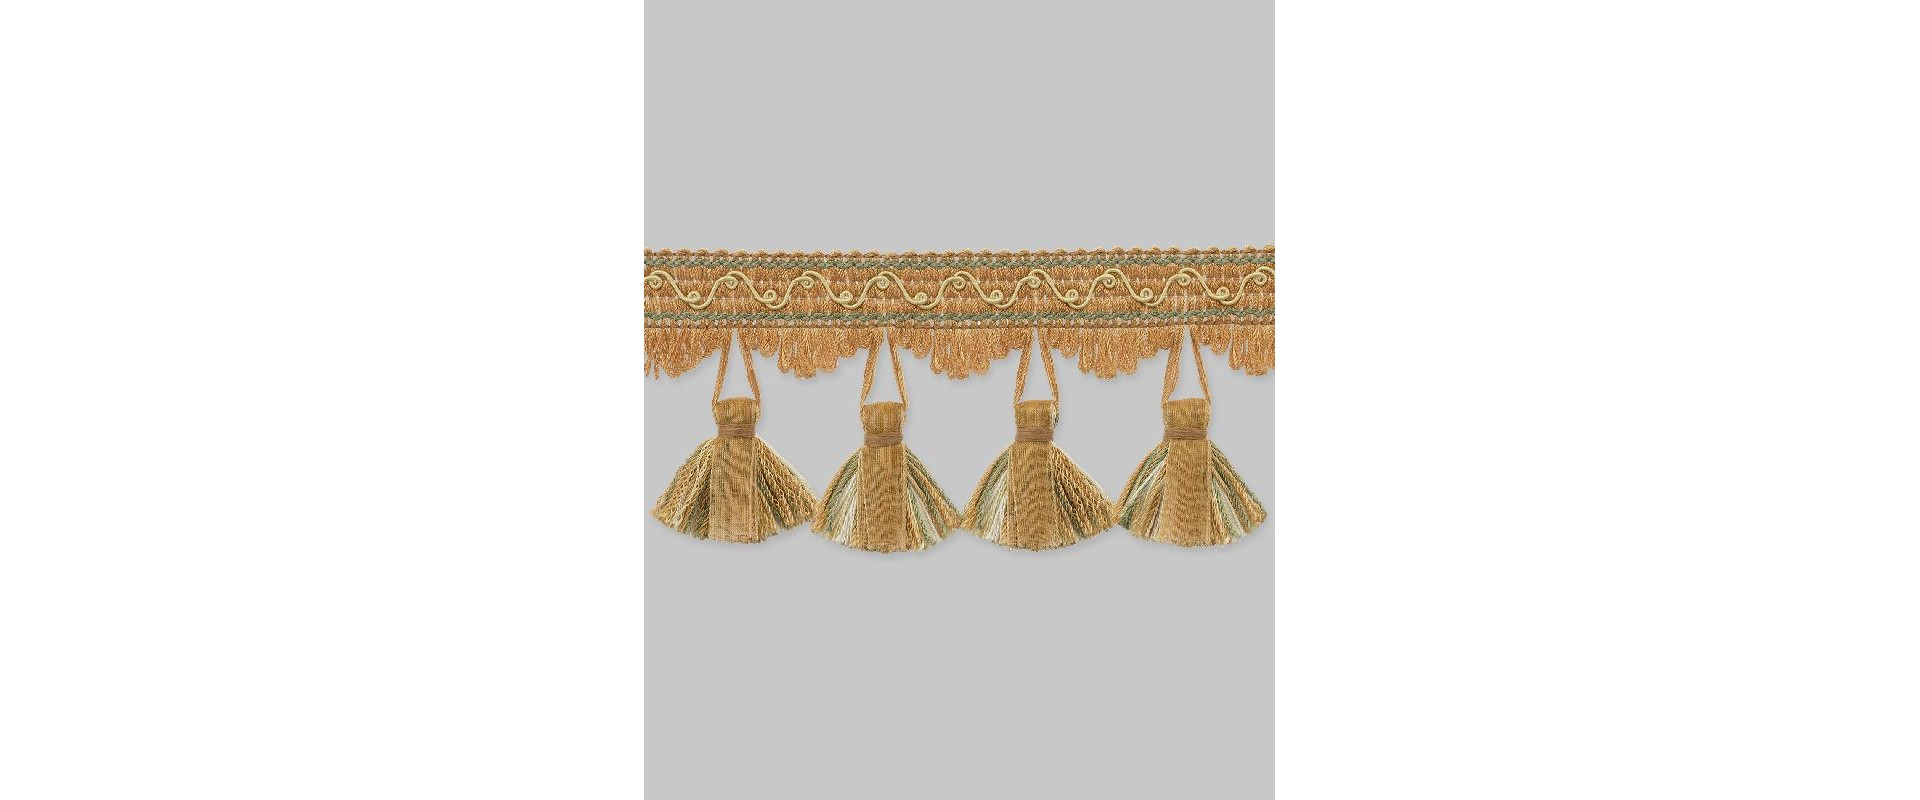 Бахрома для штор NT325-0219 светло-коричневый/золото